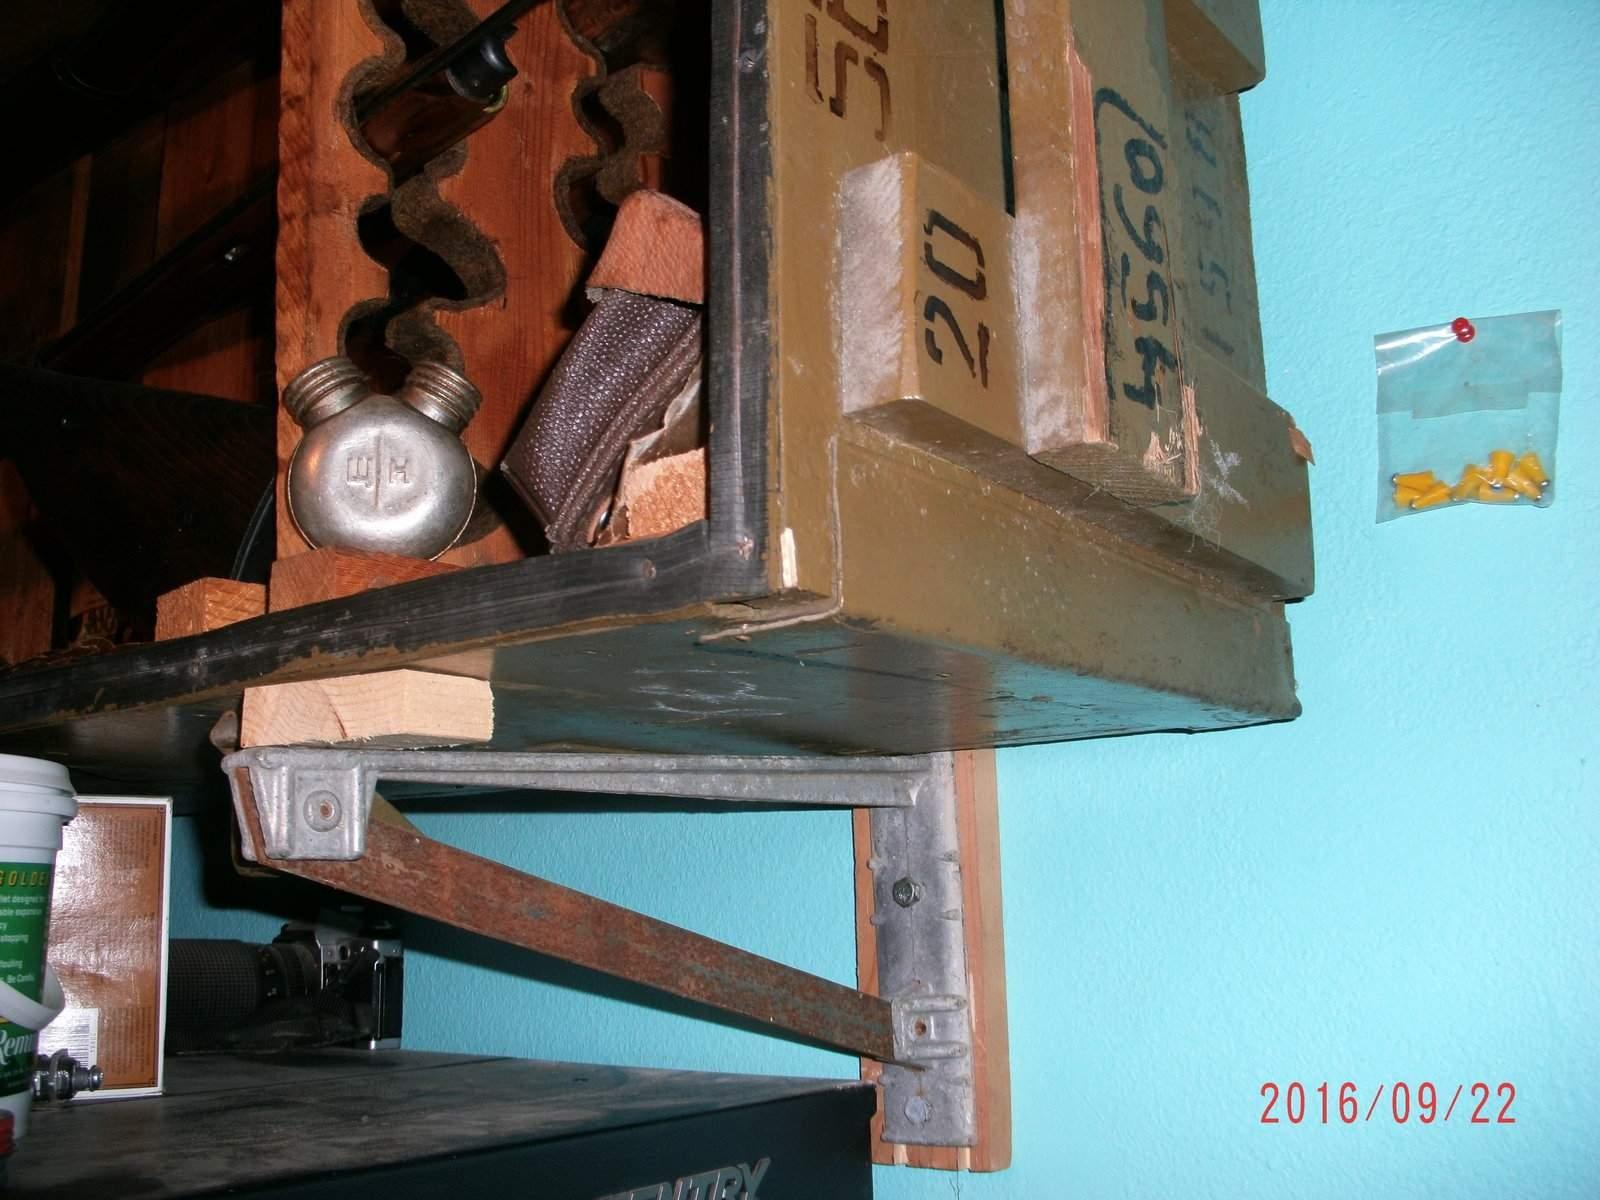 Mosin rifle crate